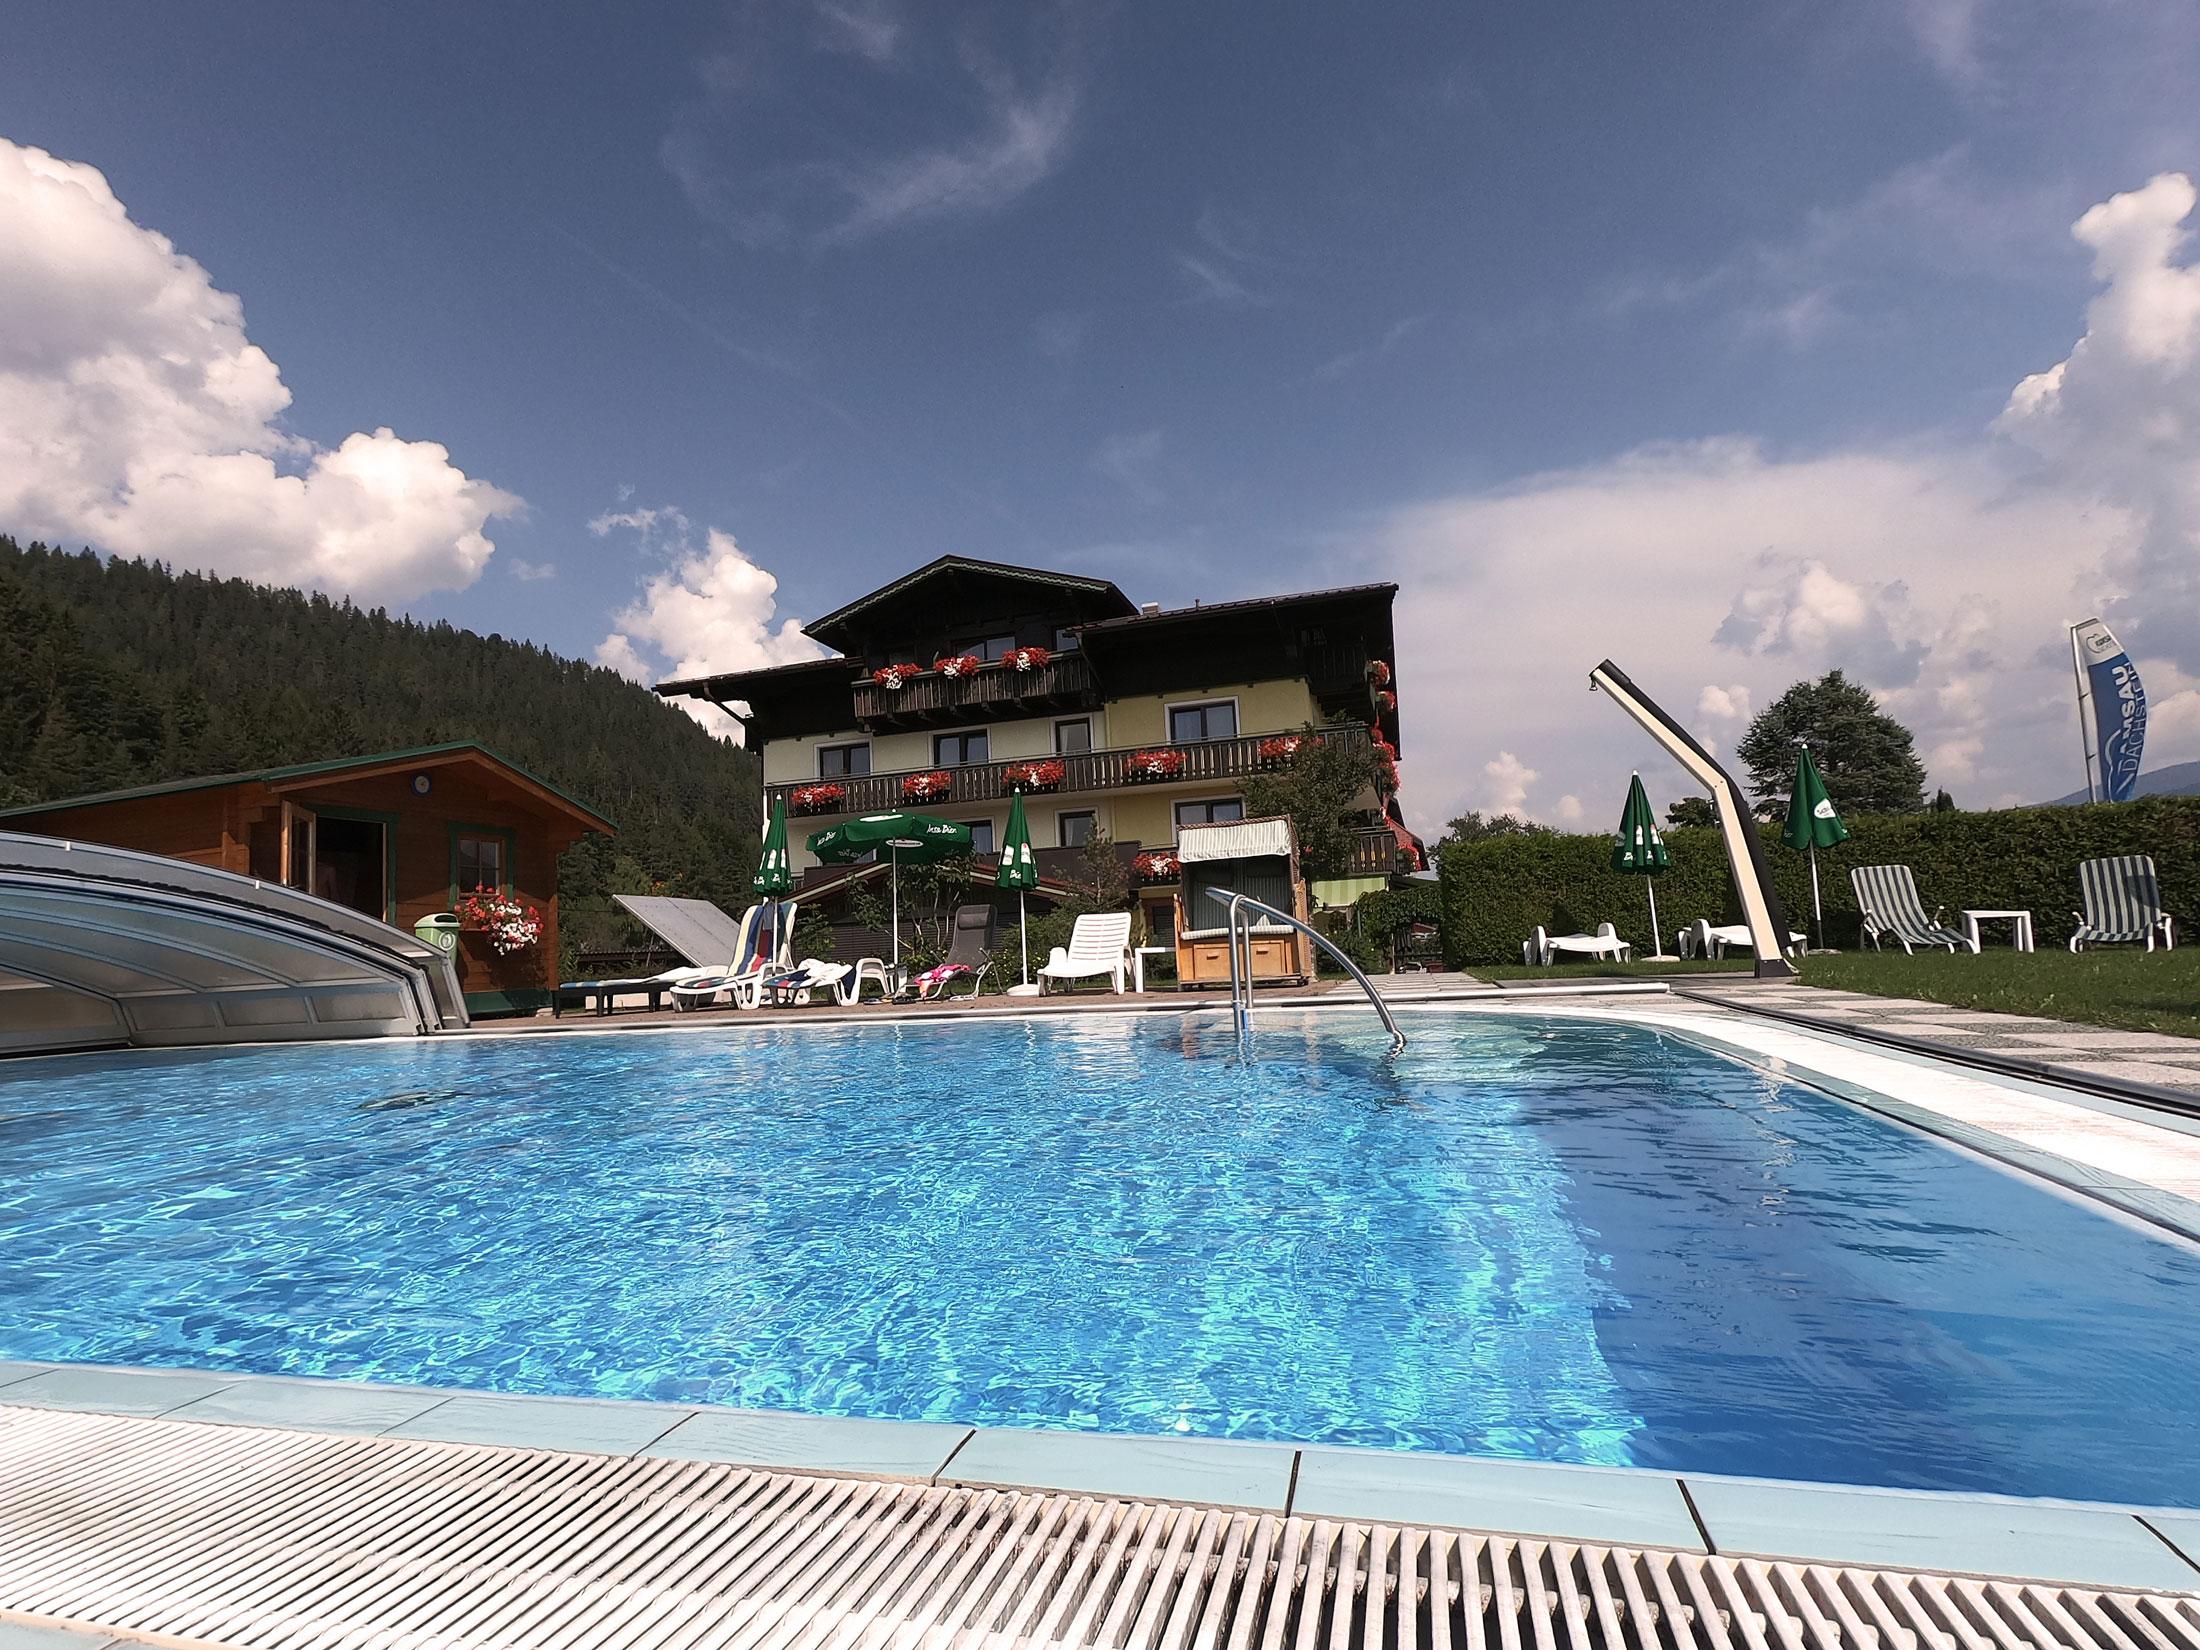 Hotel Timmelbauerhof Pool